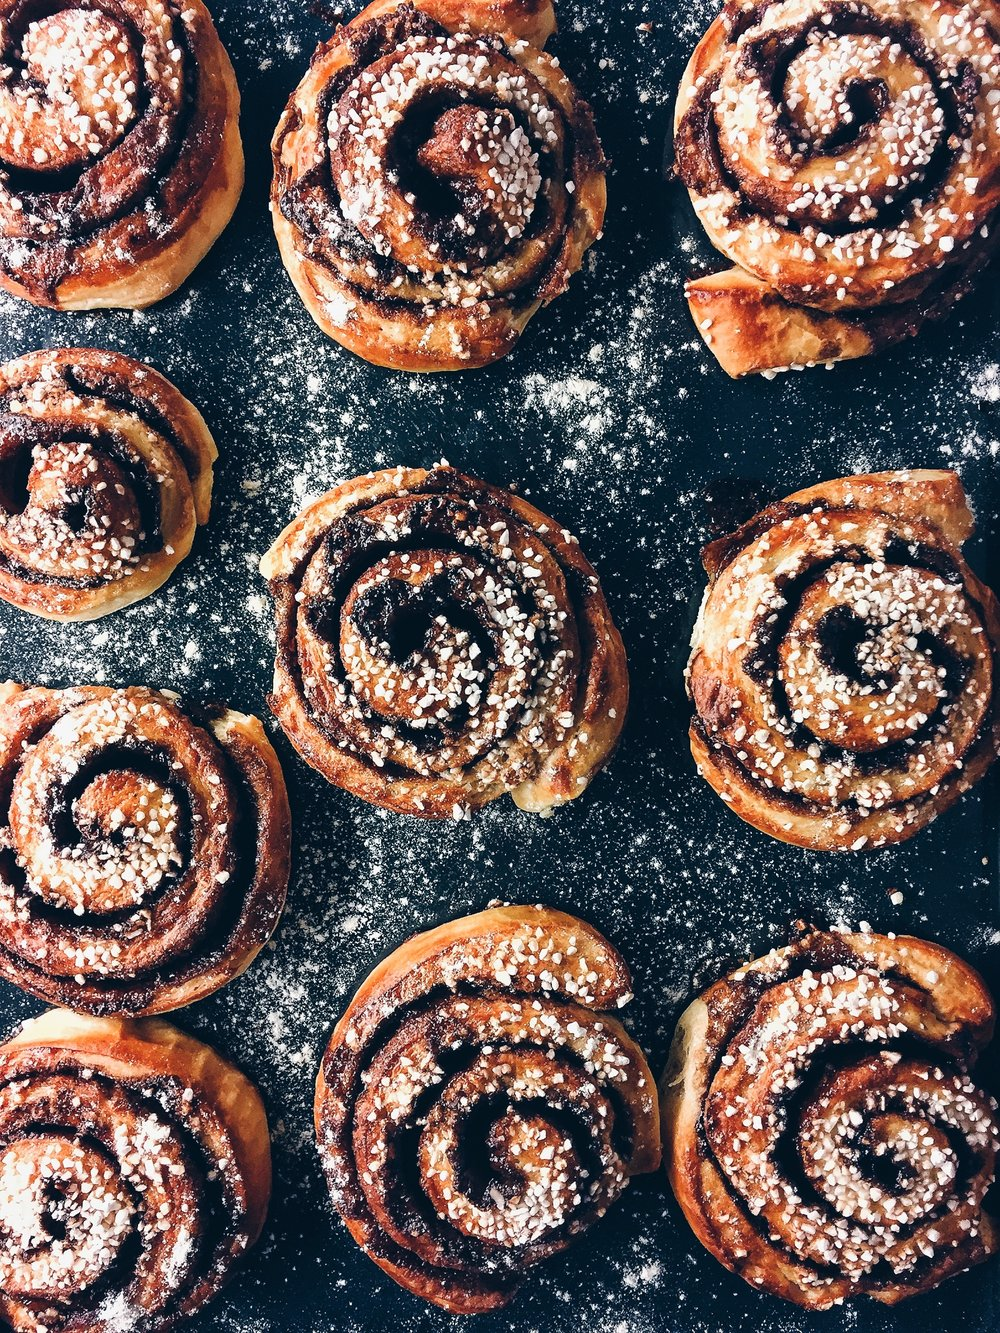 pekrana-nostress-bakery-manifesto-market-prague-2.JPG